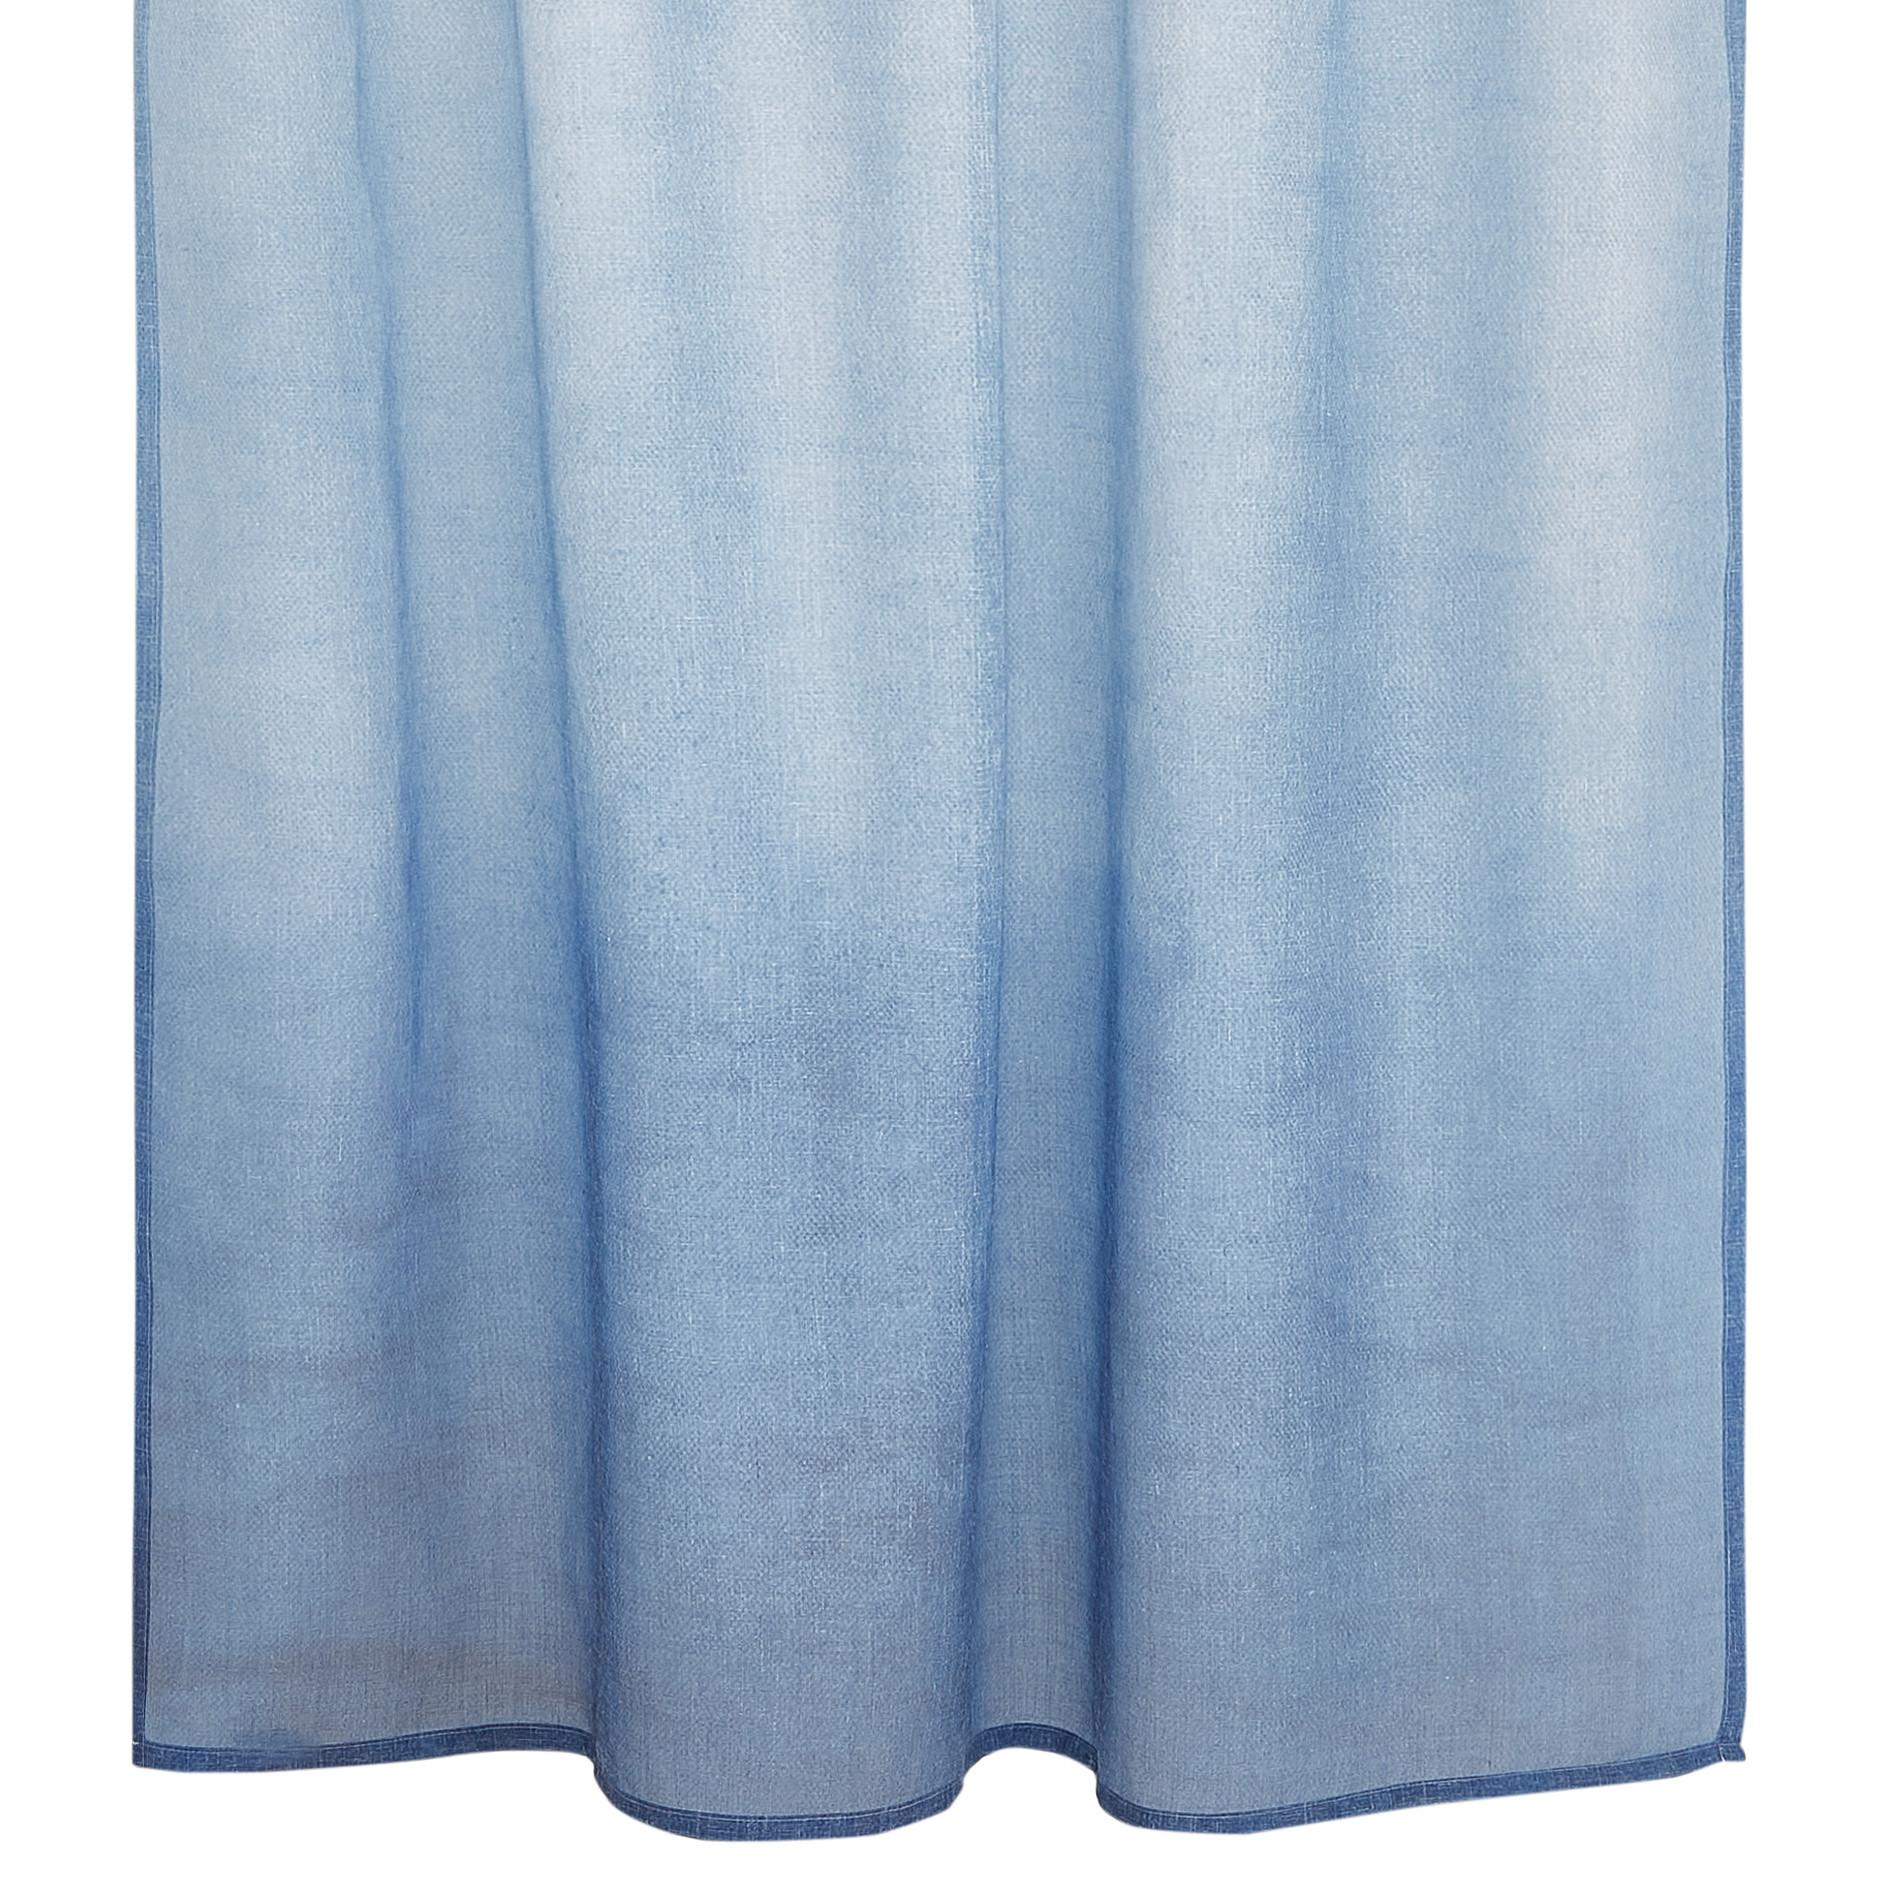 Tenda tessuto sfumato passanti nascosti, Azzurro, large image number 0